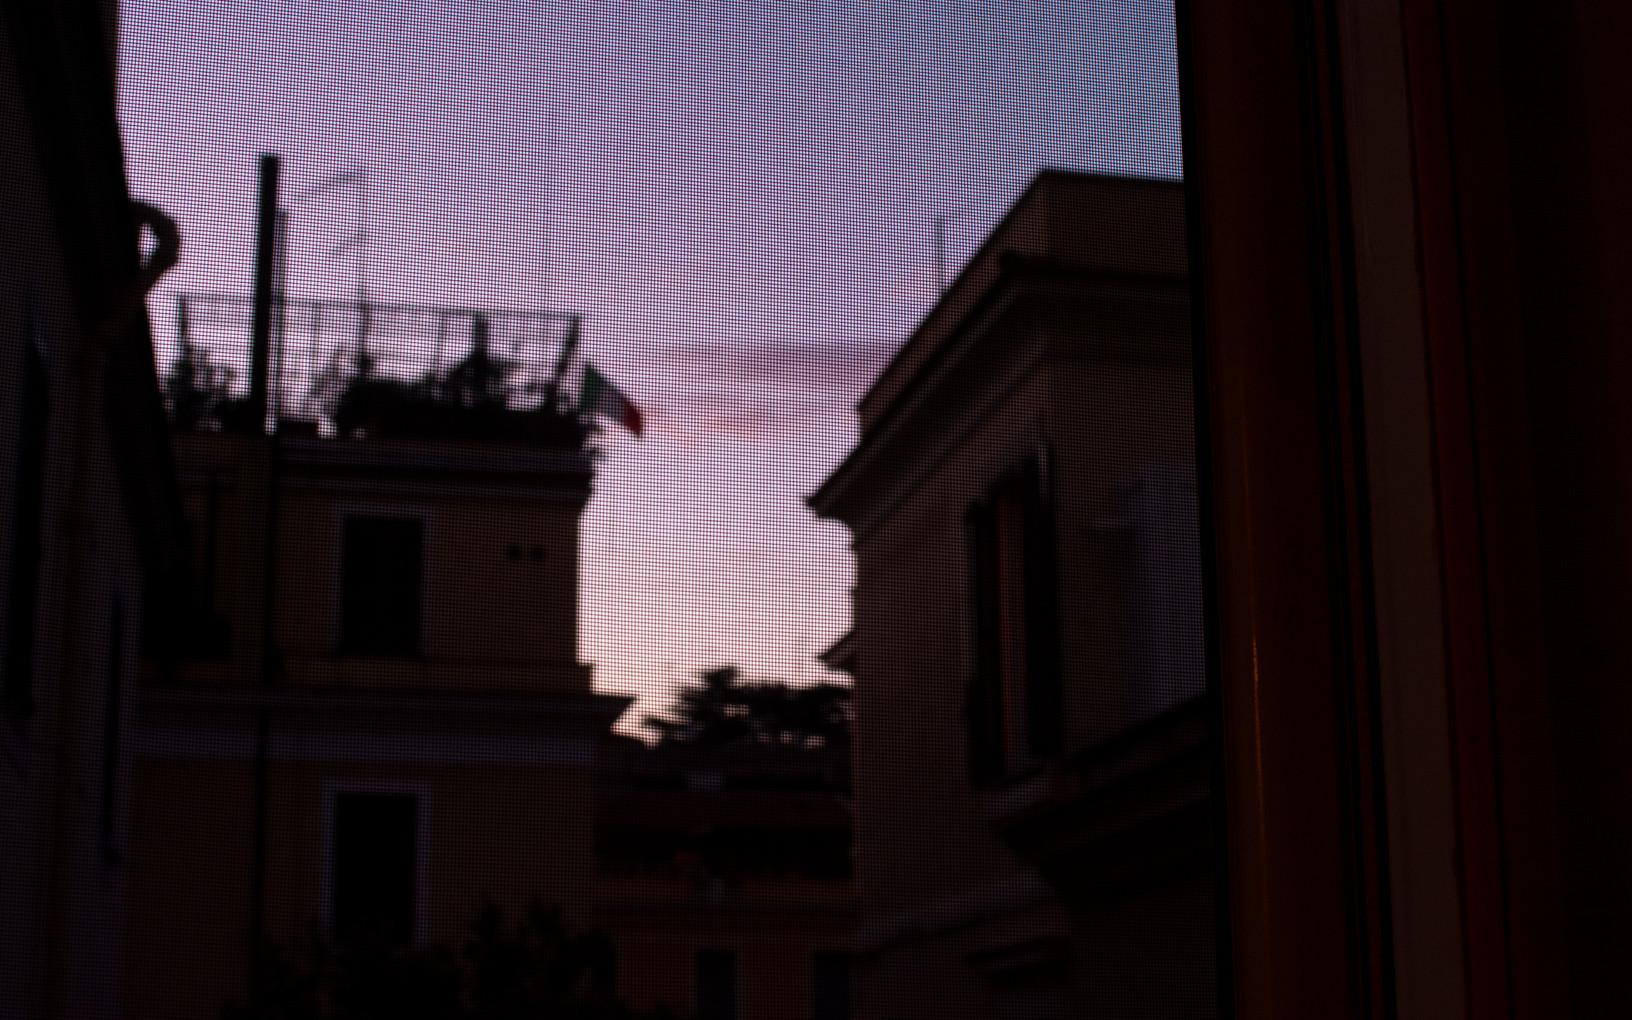 Purple Italian sunset from the living room, Rome IT, September 2020.